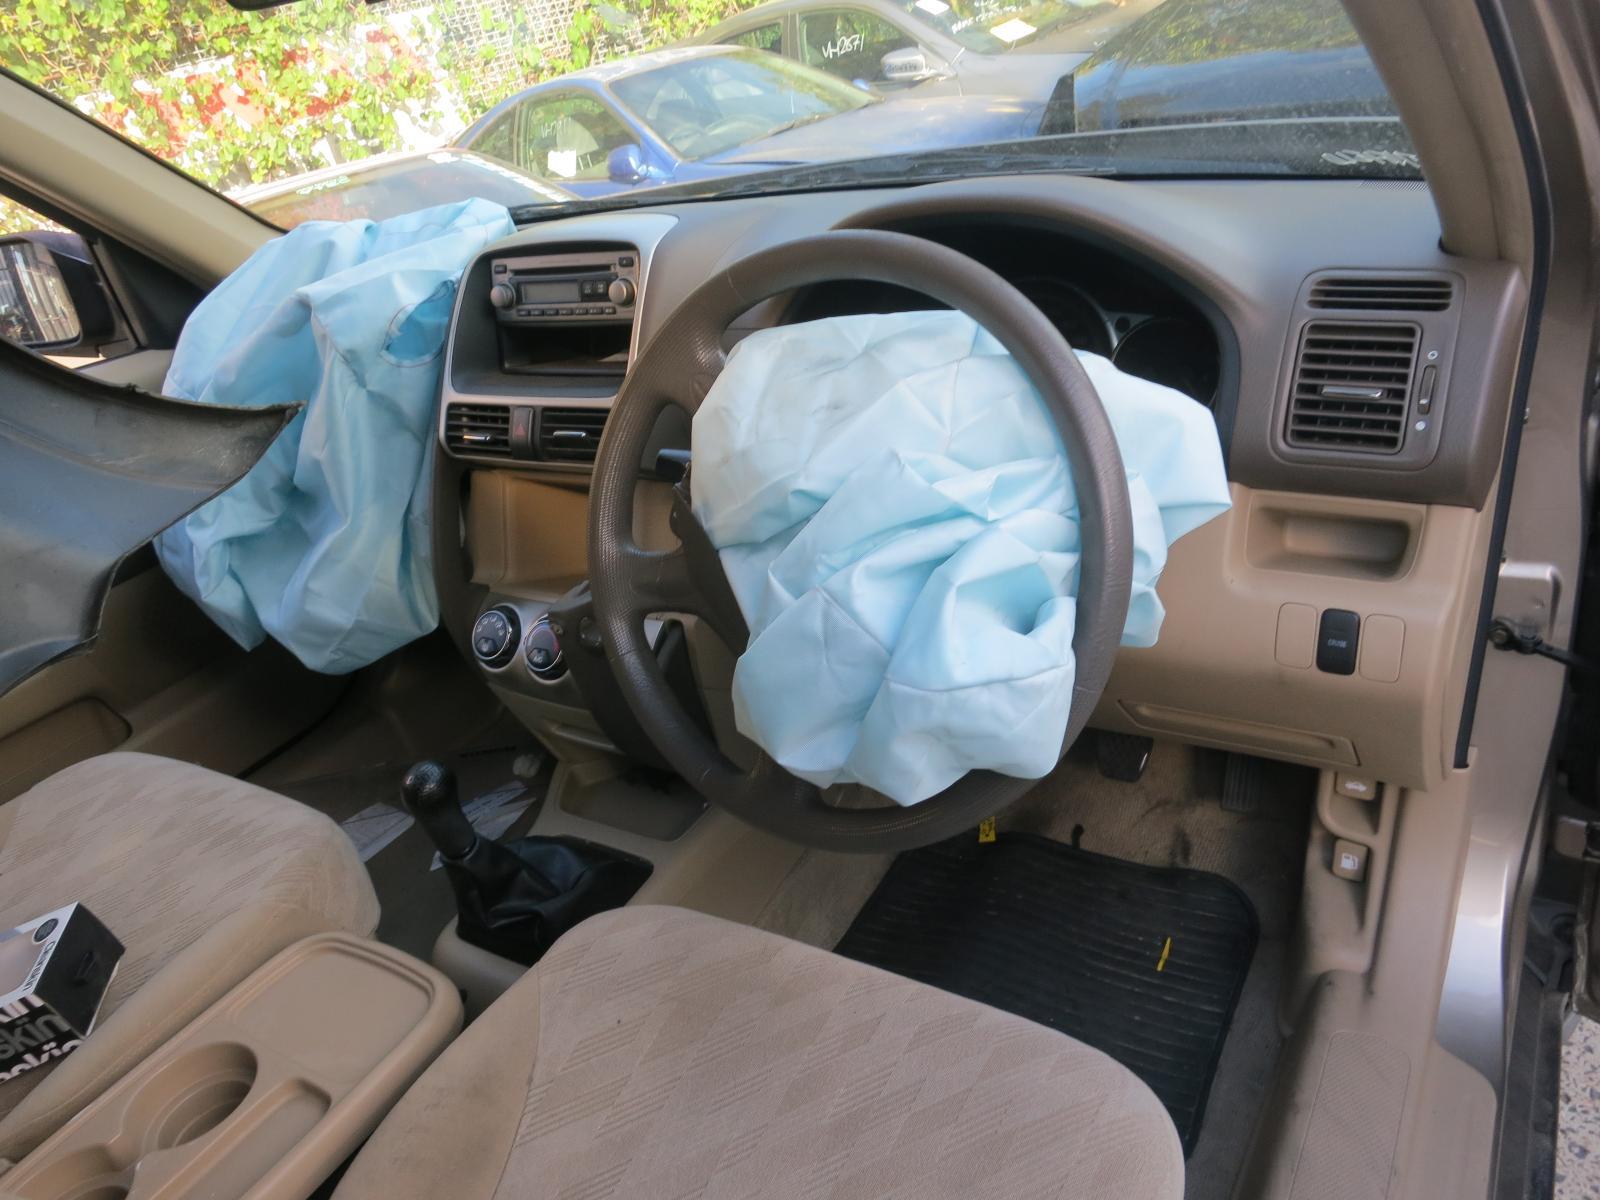 Steering Pump Crv Honda 2005 on